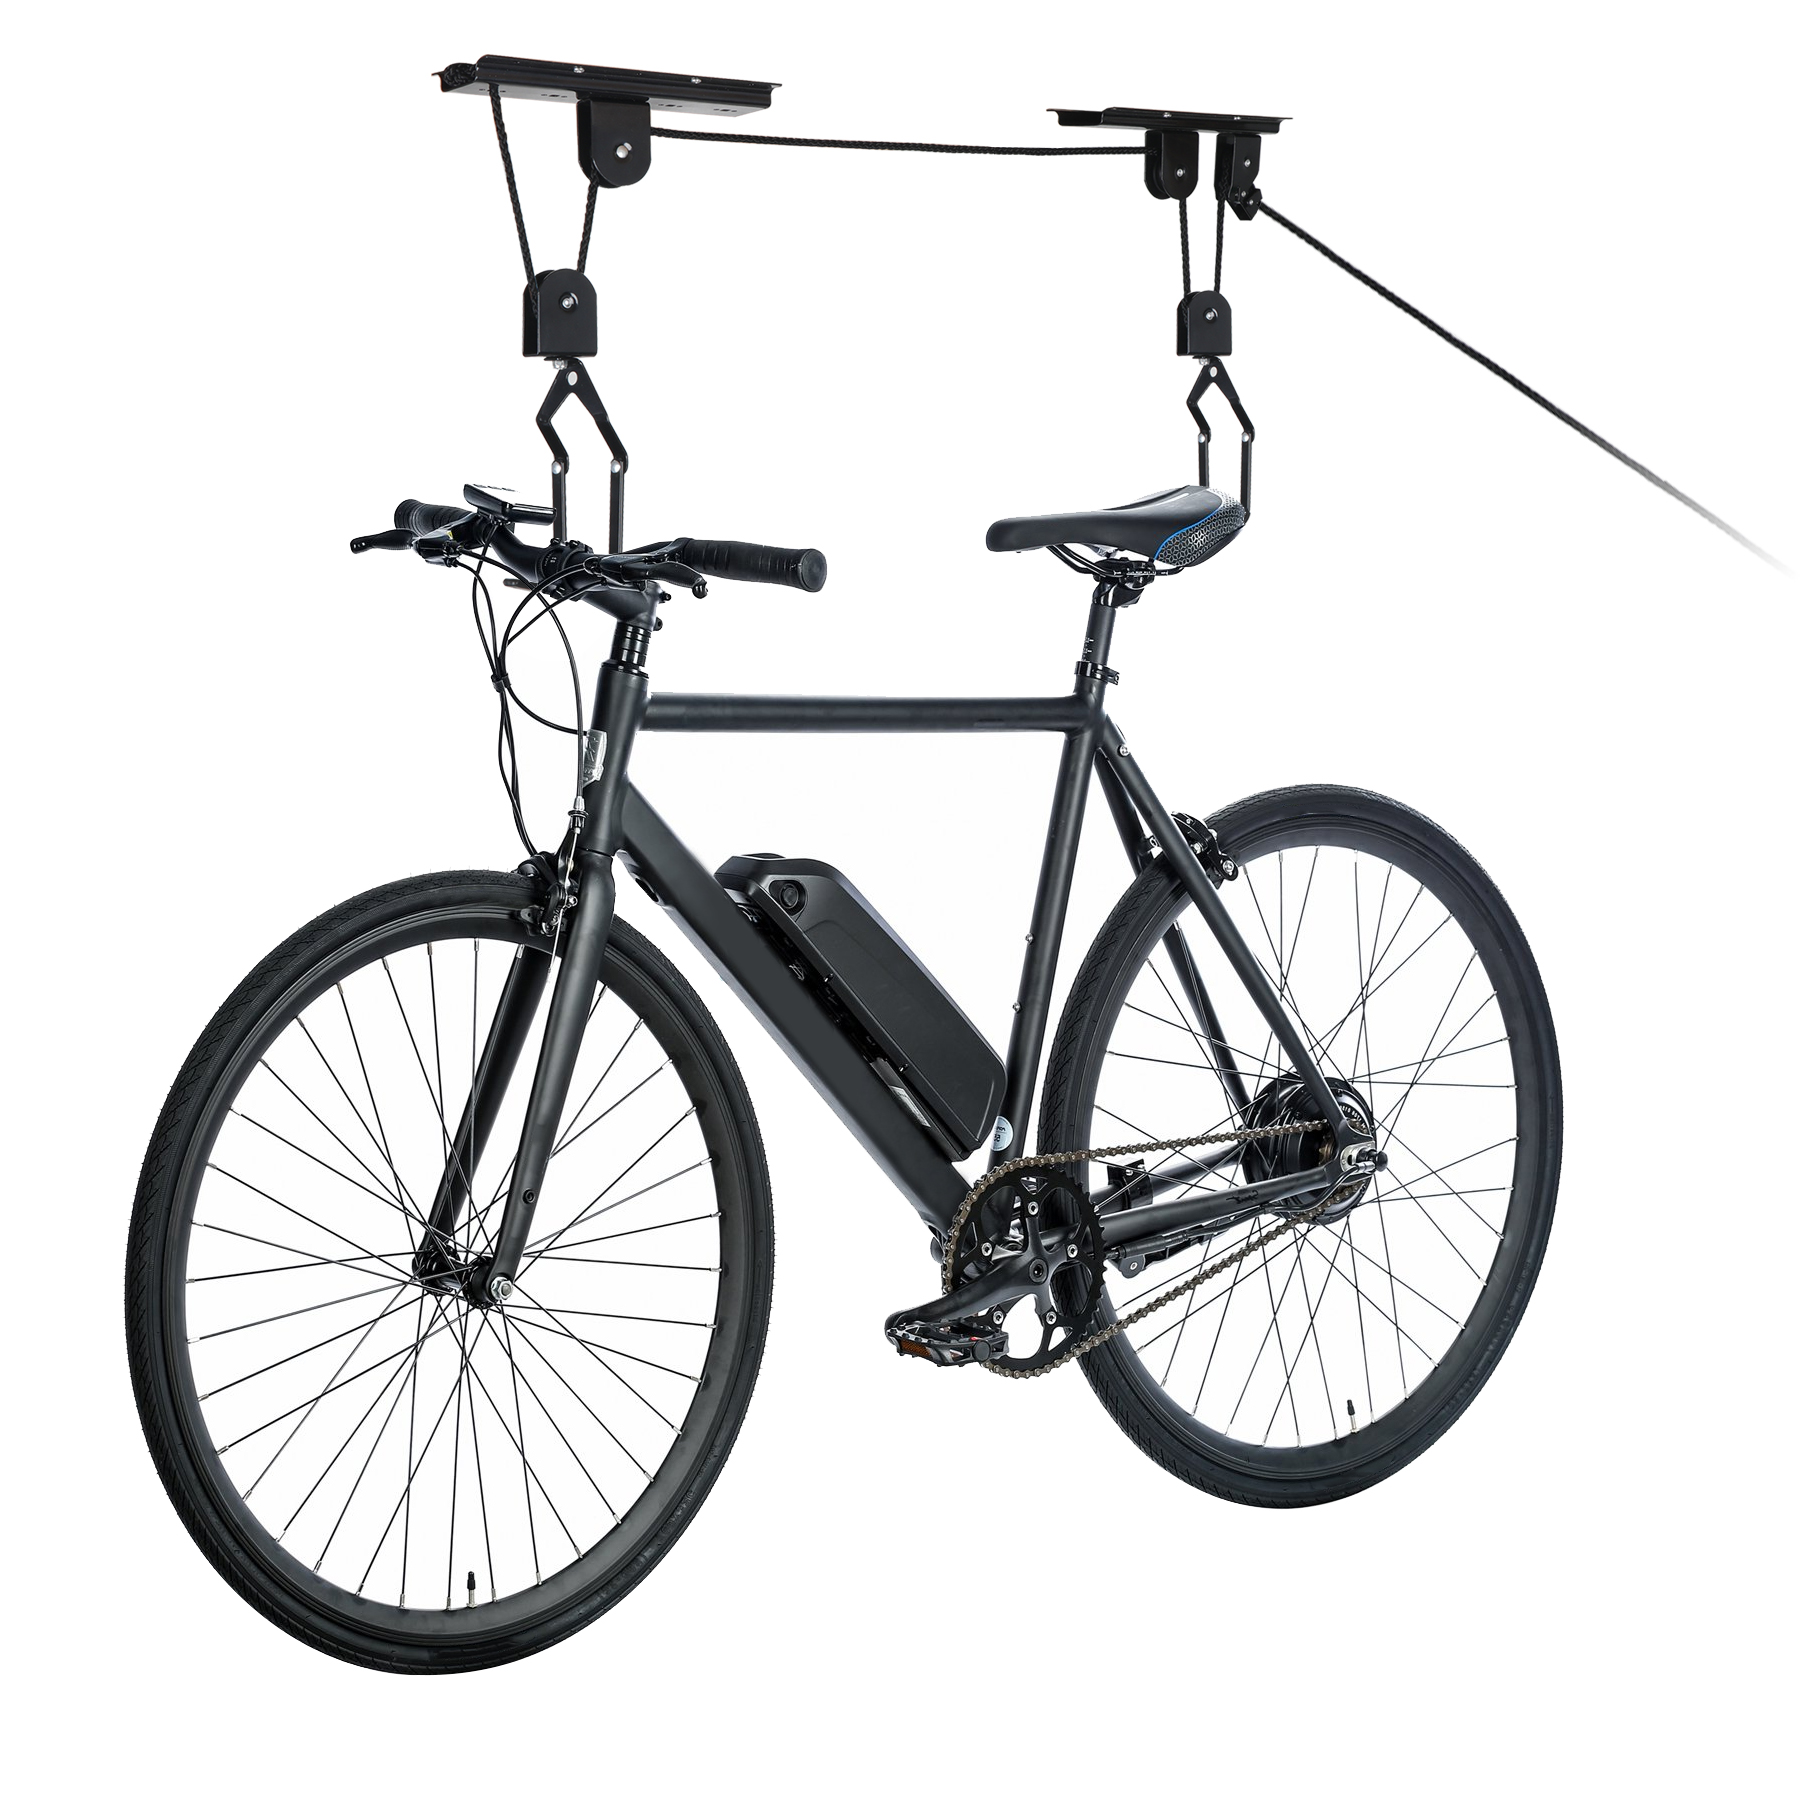 Ceiling Bike Rack >> Zeny Heavy Duty Bike Lift Hoist For Garage Storage Ceiling Mounted